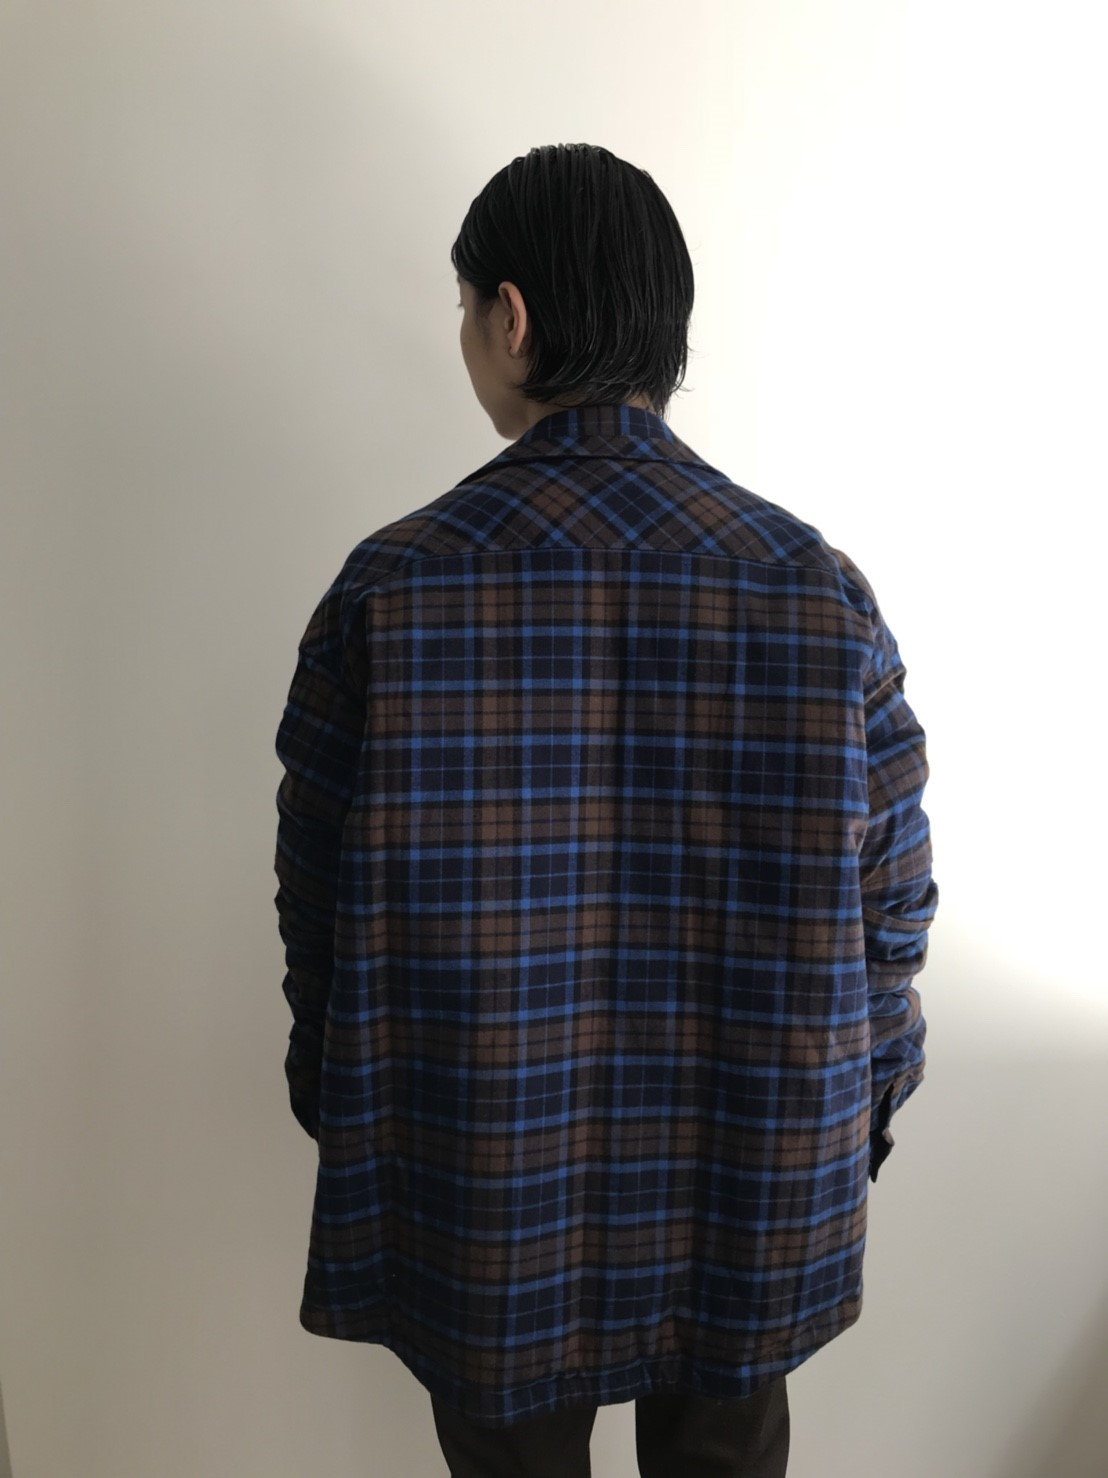 20180819_180819_0021